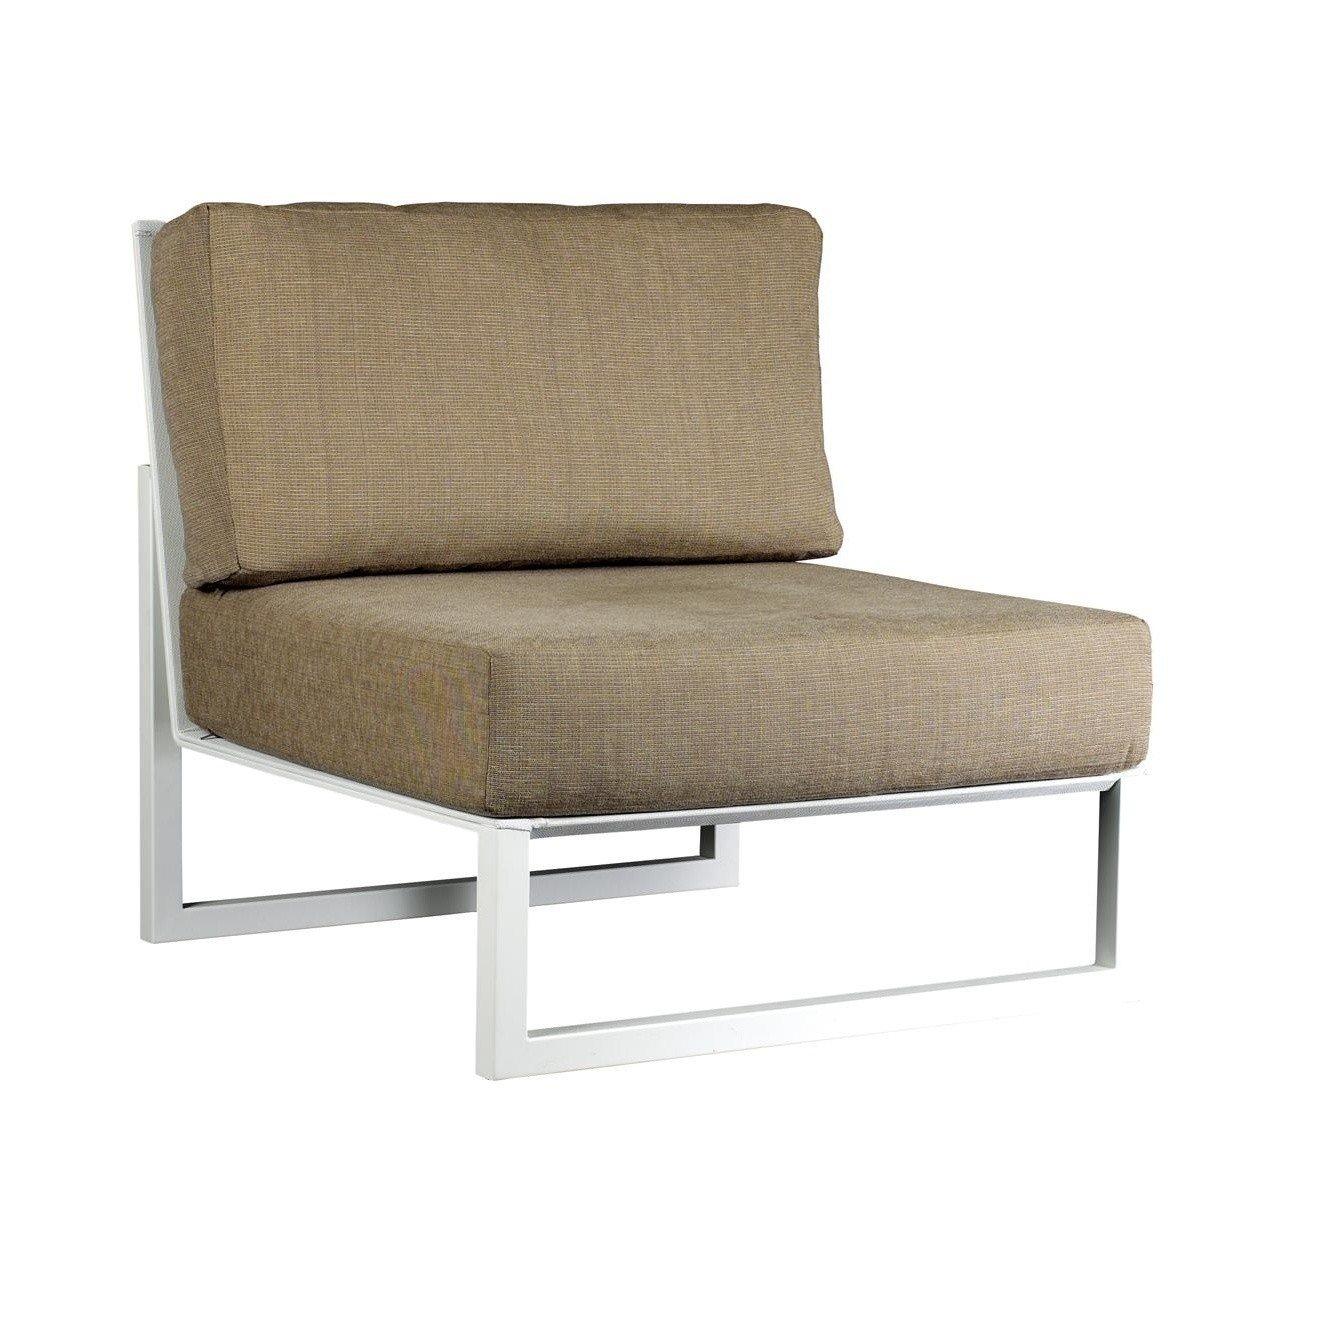 Royal Botania Ninix Lounge Sofa Module | AmbienteDirect